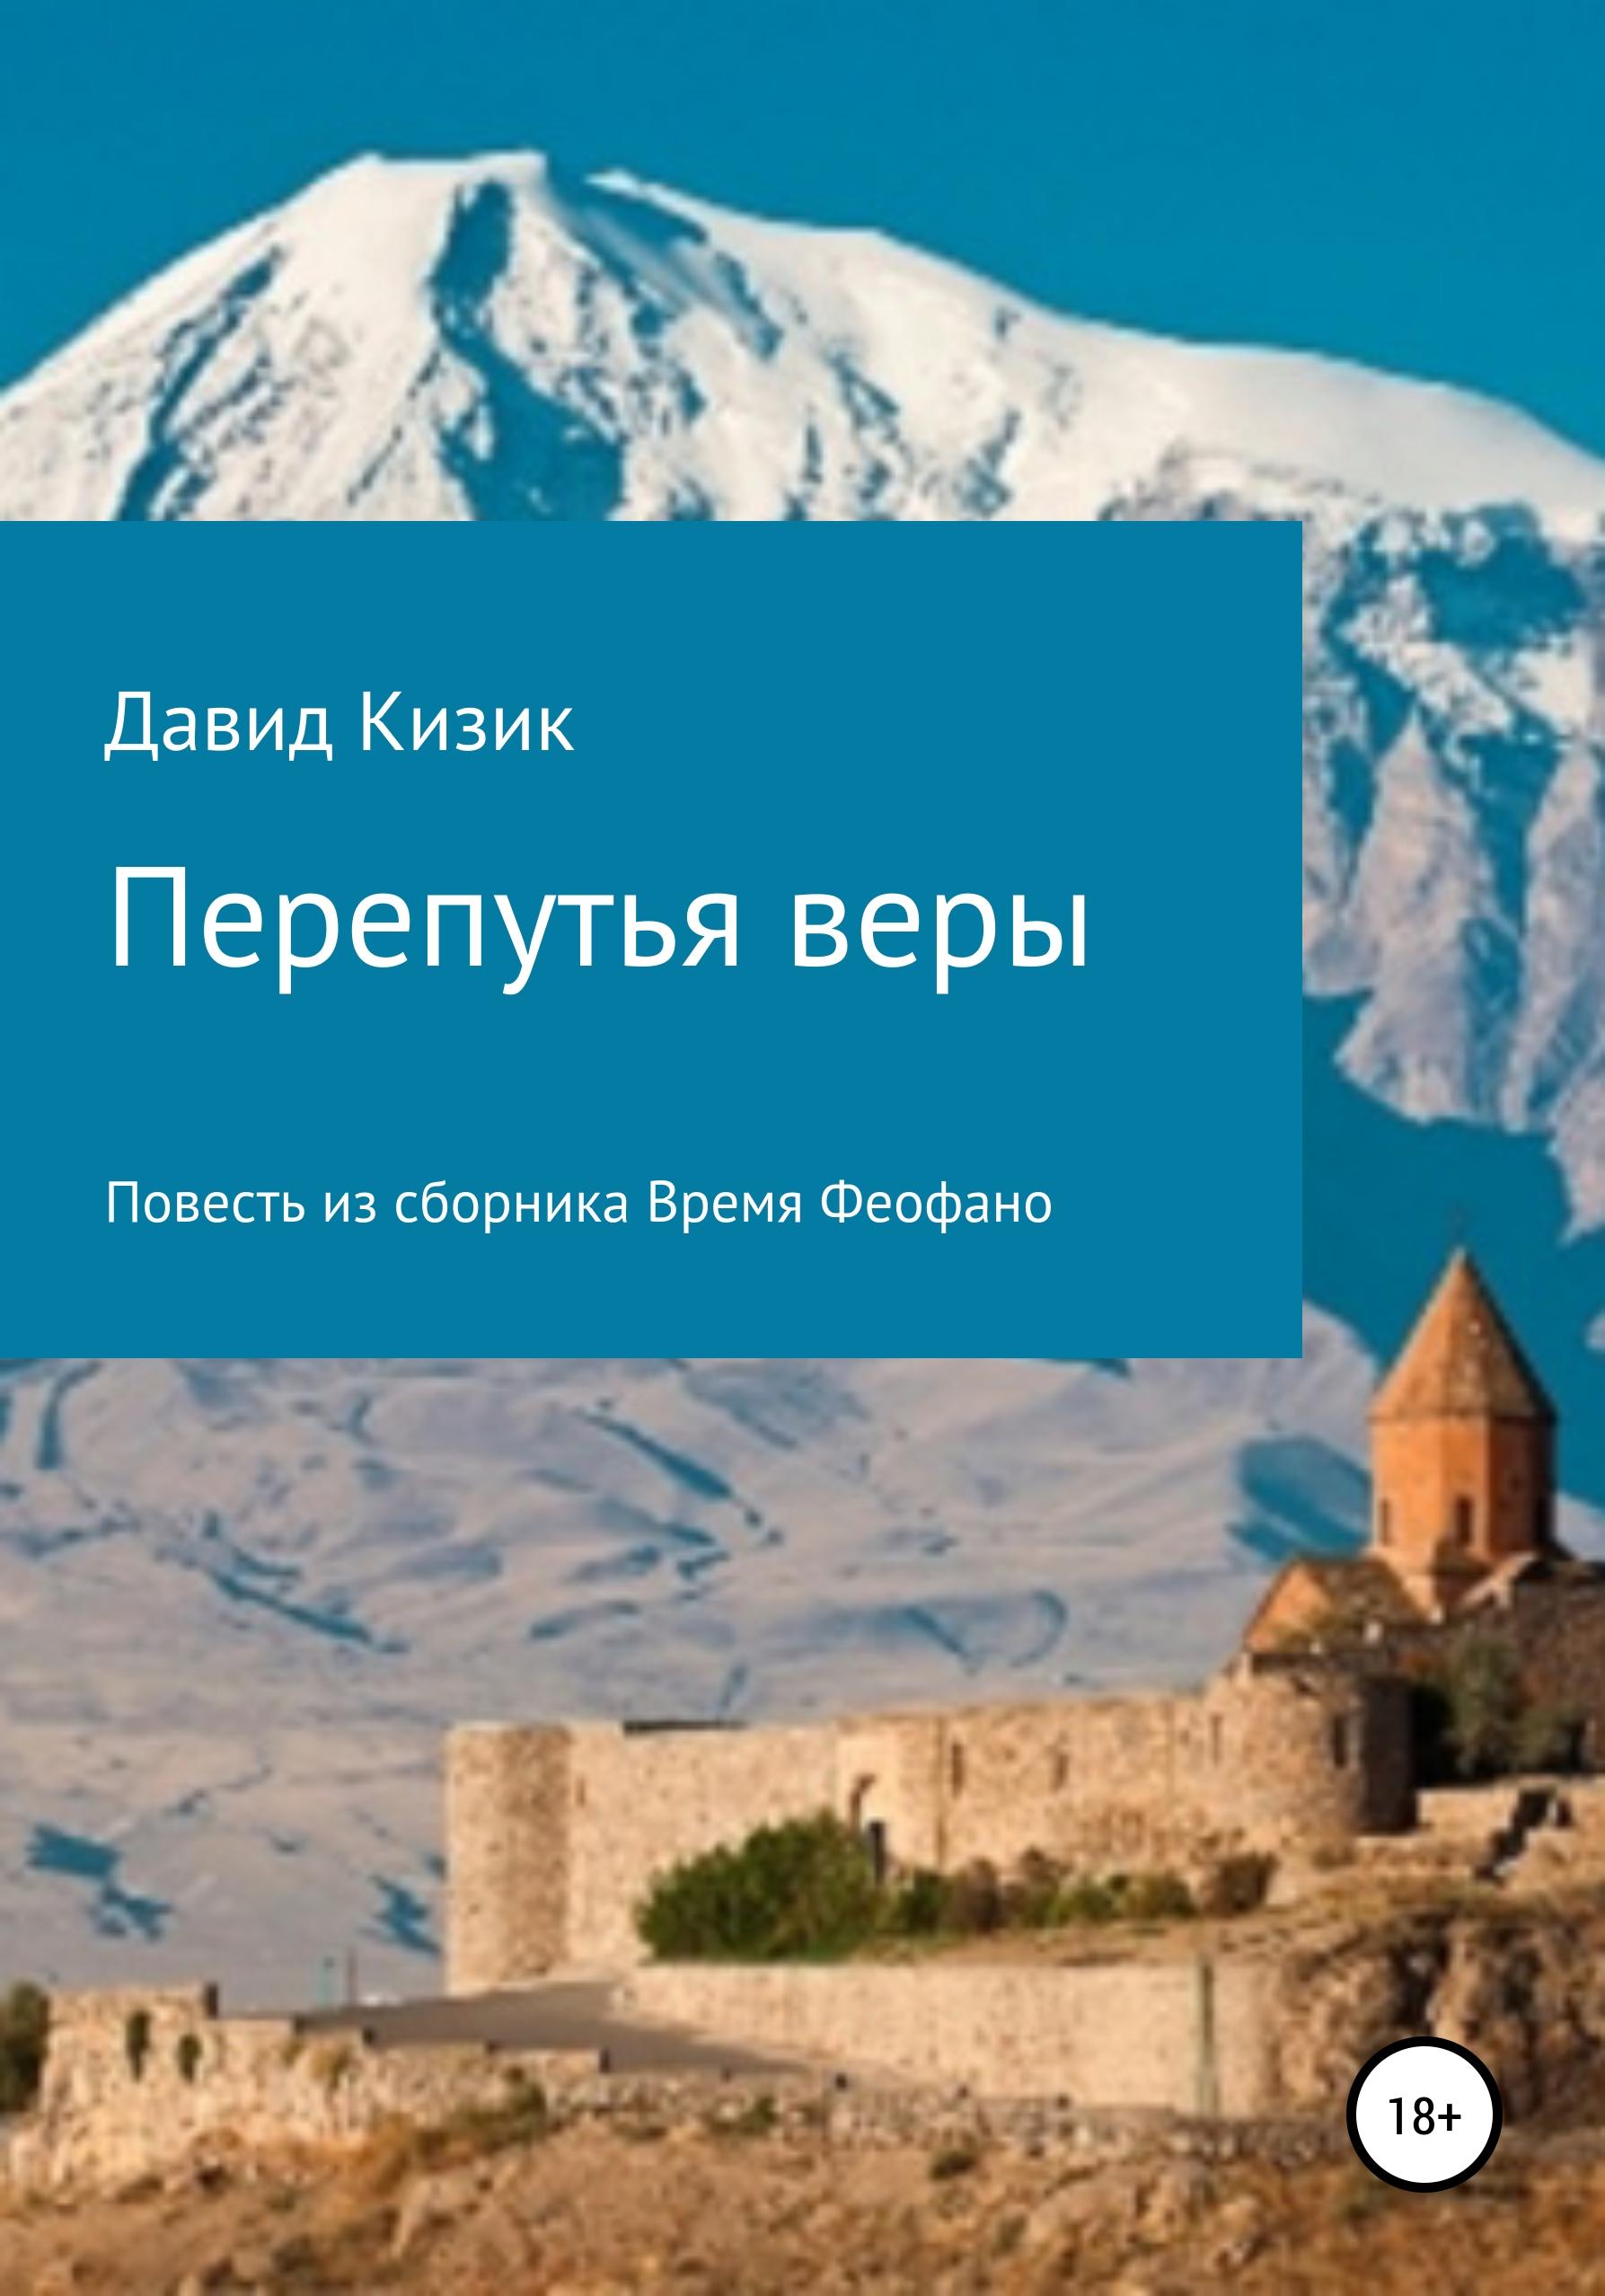 Давид Кизик Константин и патриарх Полиевкт давид кизик константин и наместница ольга